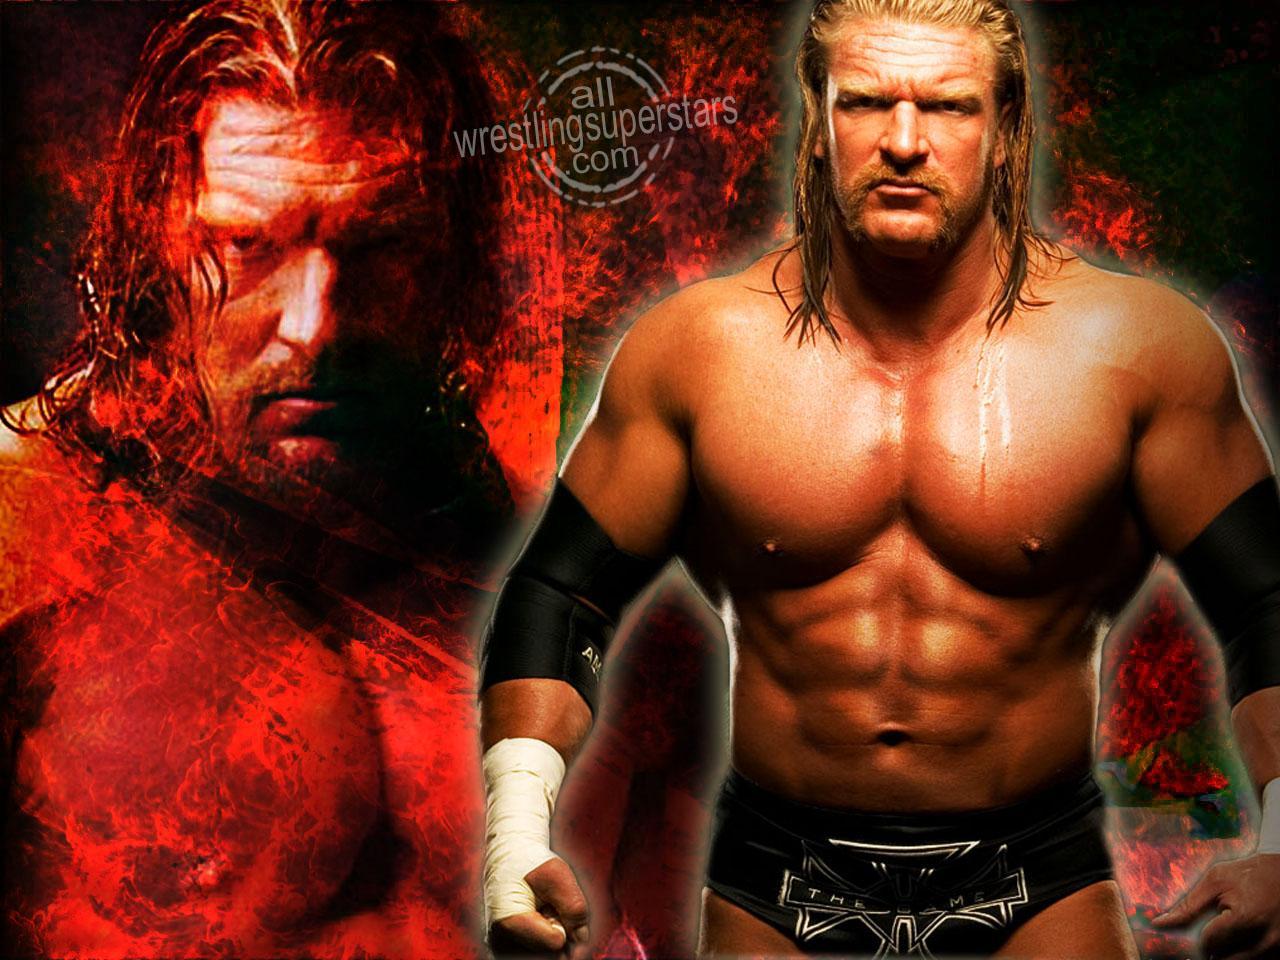 WWE Superstar Wallpaper Wallpaper amp Pictures 1280x960